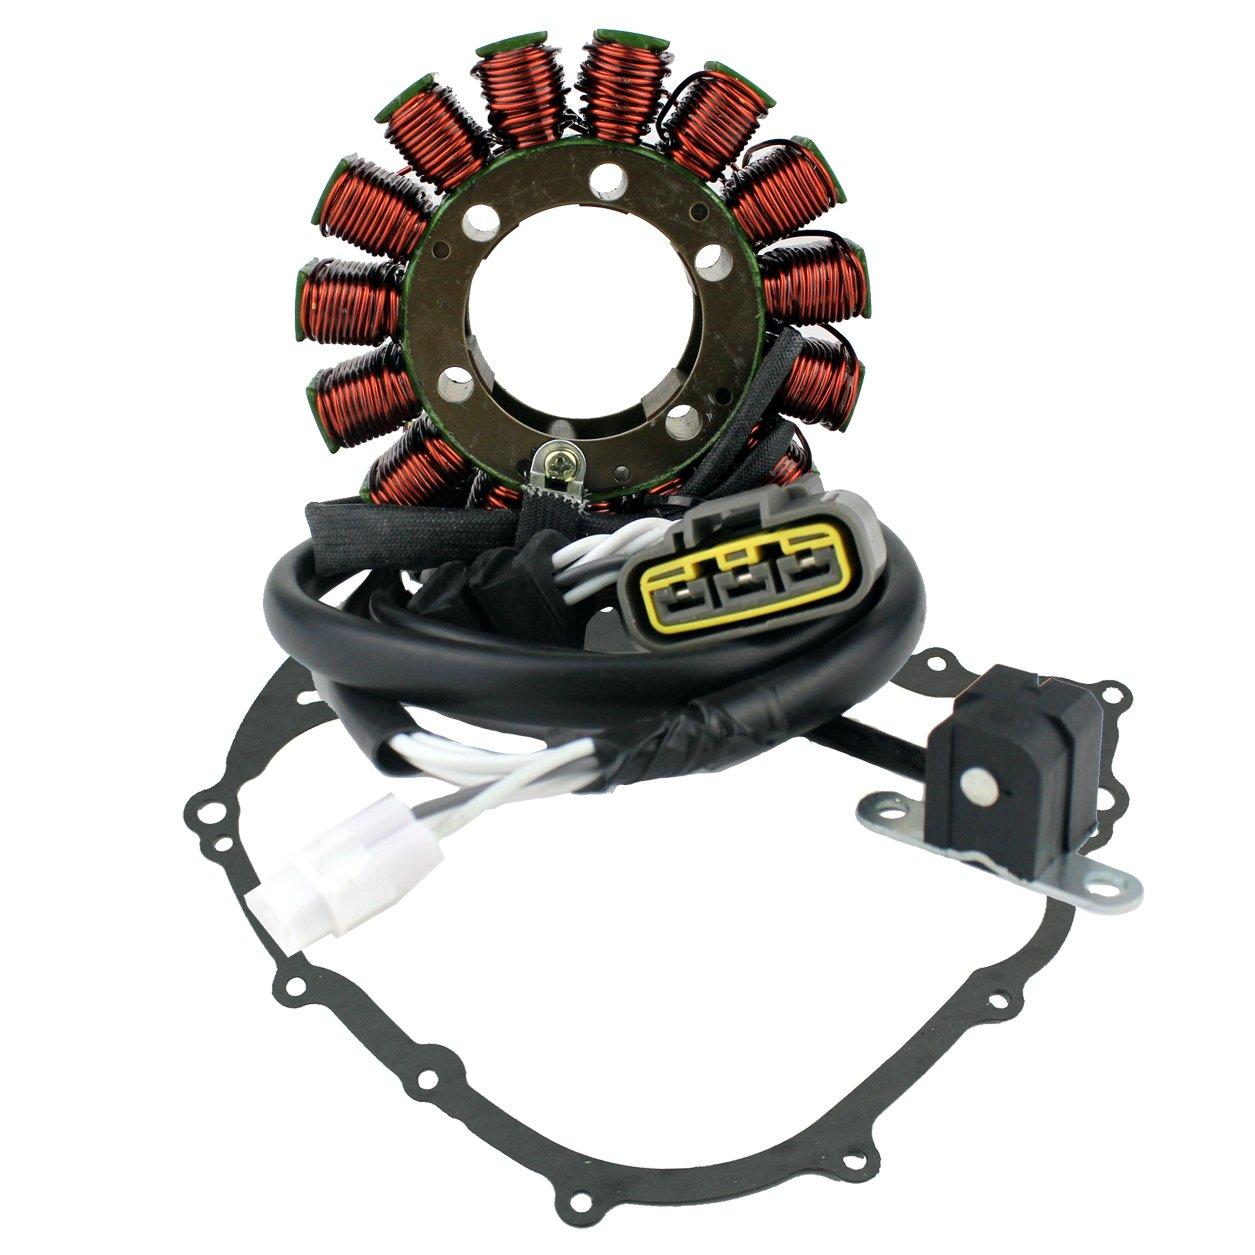 Generator Stator For Yamaha YFM 550 700 Grizzly 2007 2008 2009 2010 2011 2012 2013 2014 2015 OEM Repl.# 28P-81410-00-00 3B4-81410-00-00 28P-81410-01-00 RMSTATOR